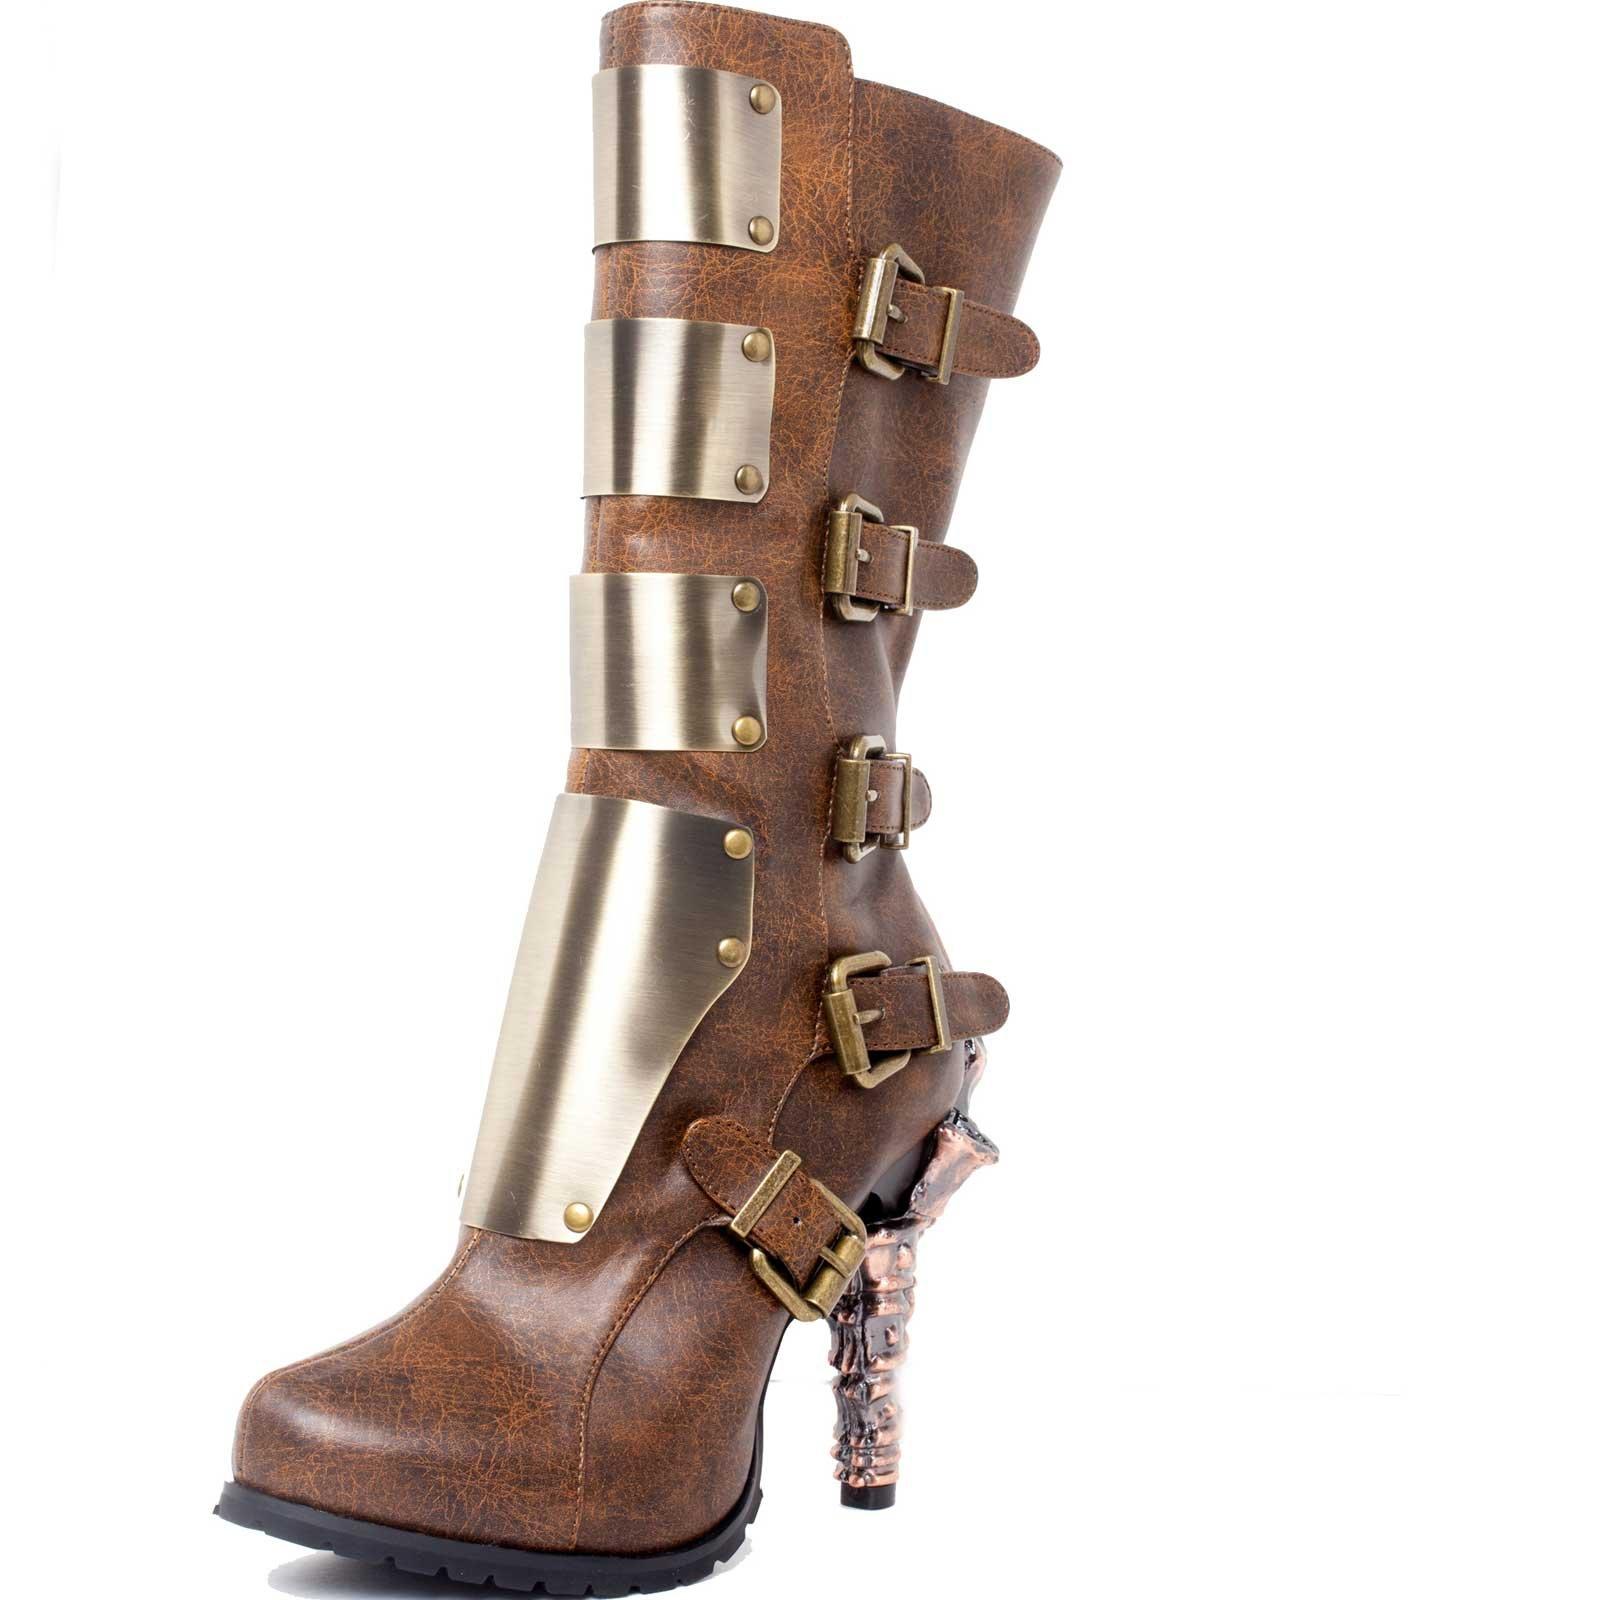 HADES Steampunk Prehistoric Claw Heel Knee High Biker Boot Inner Zip VARGA Brown-8